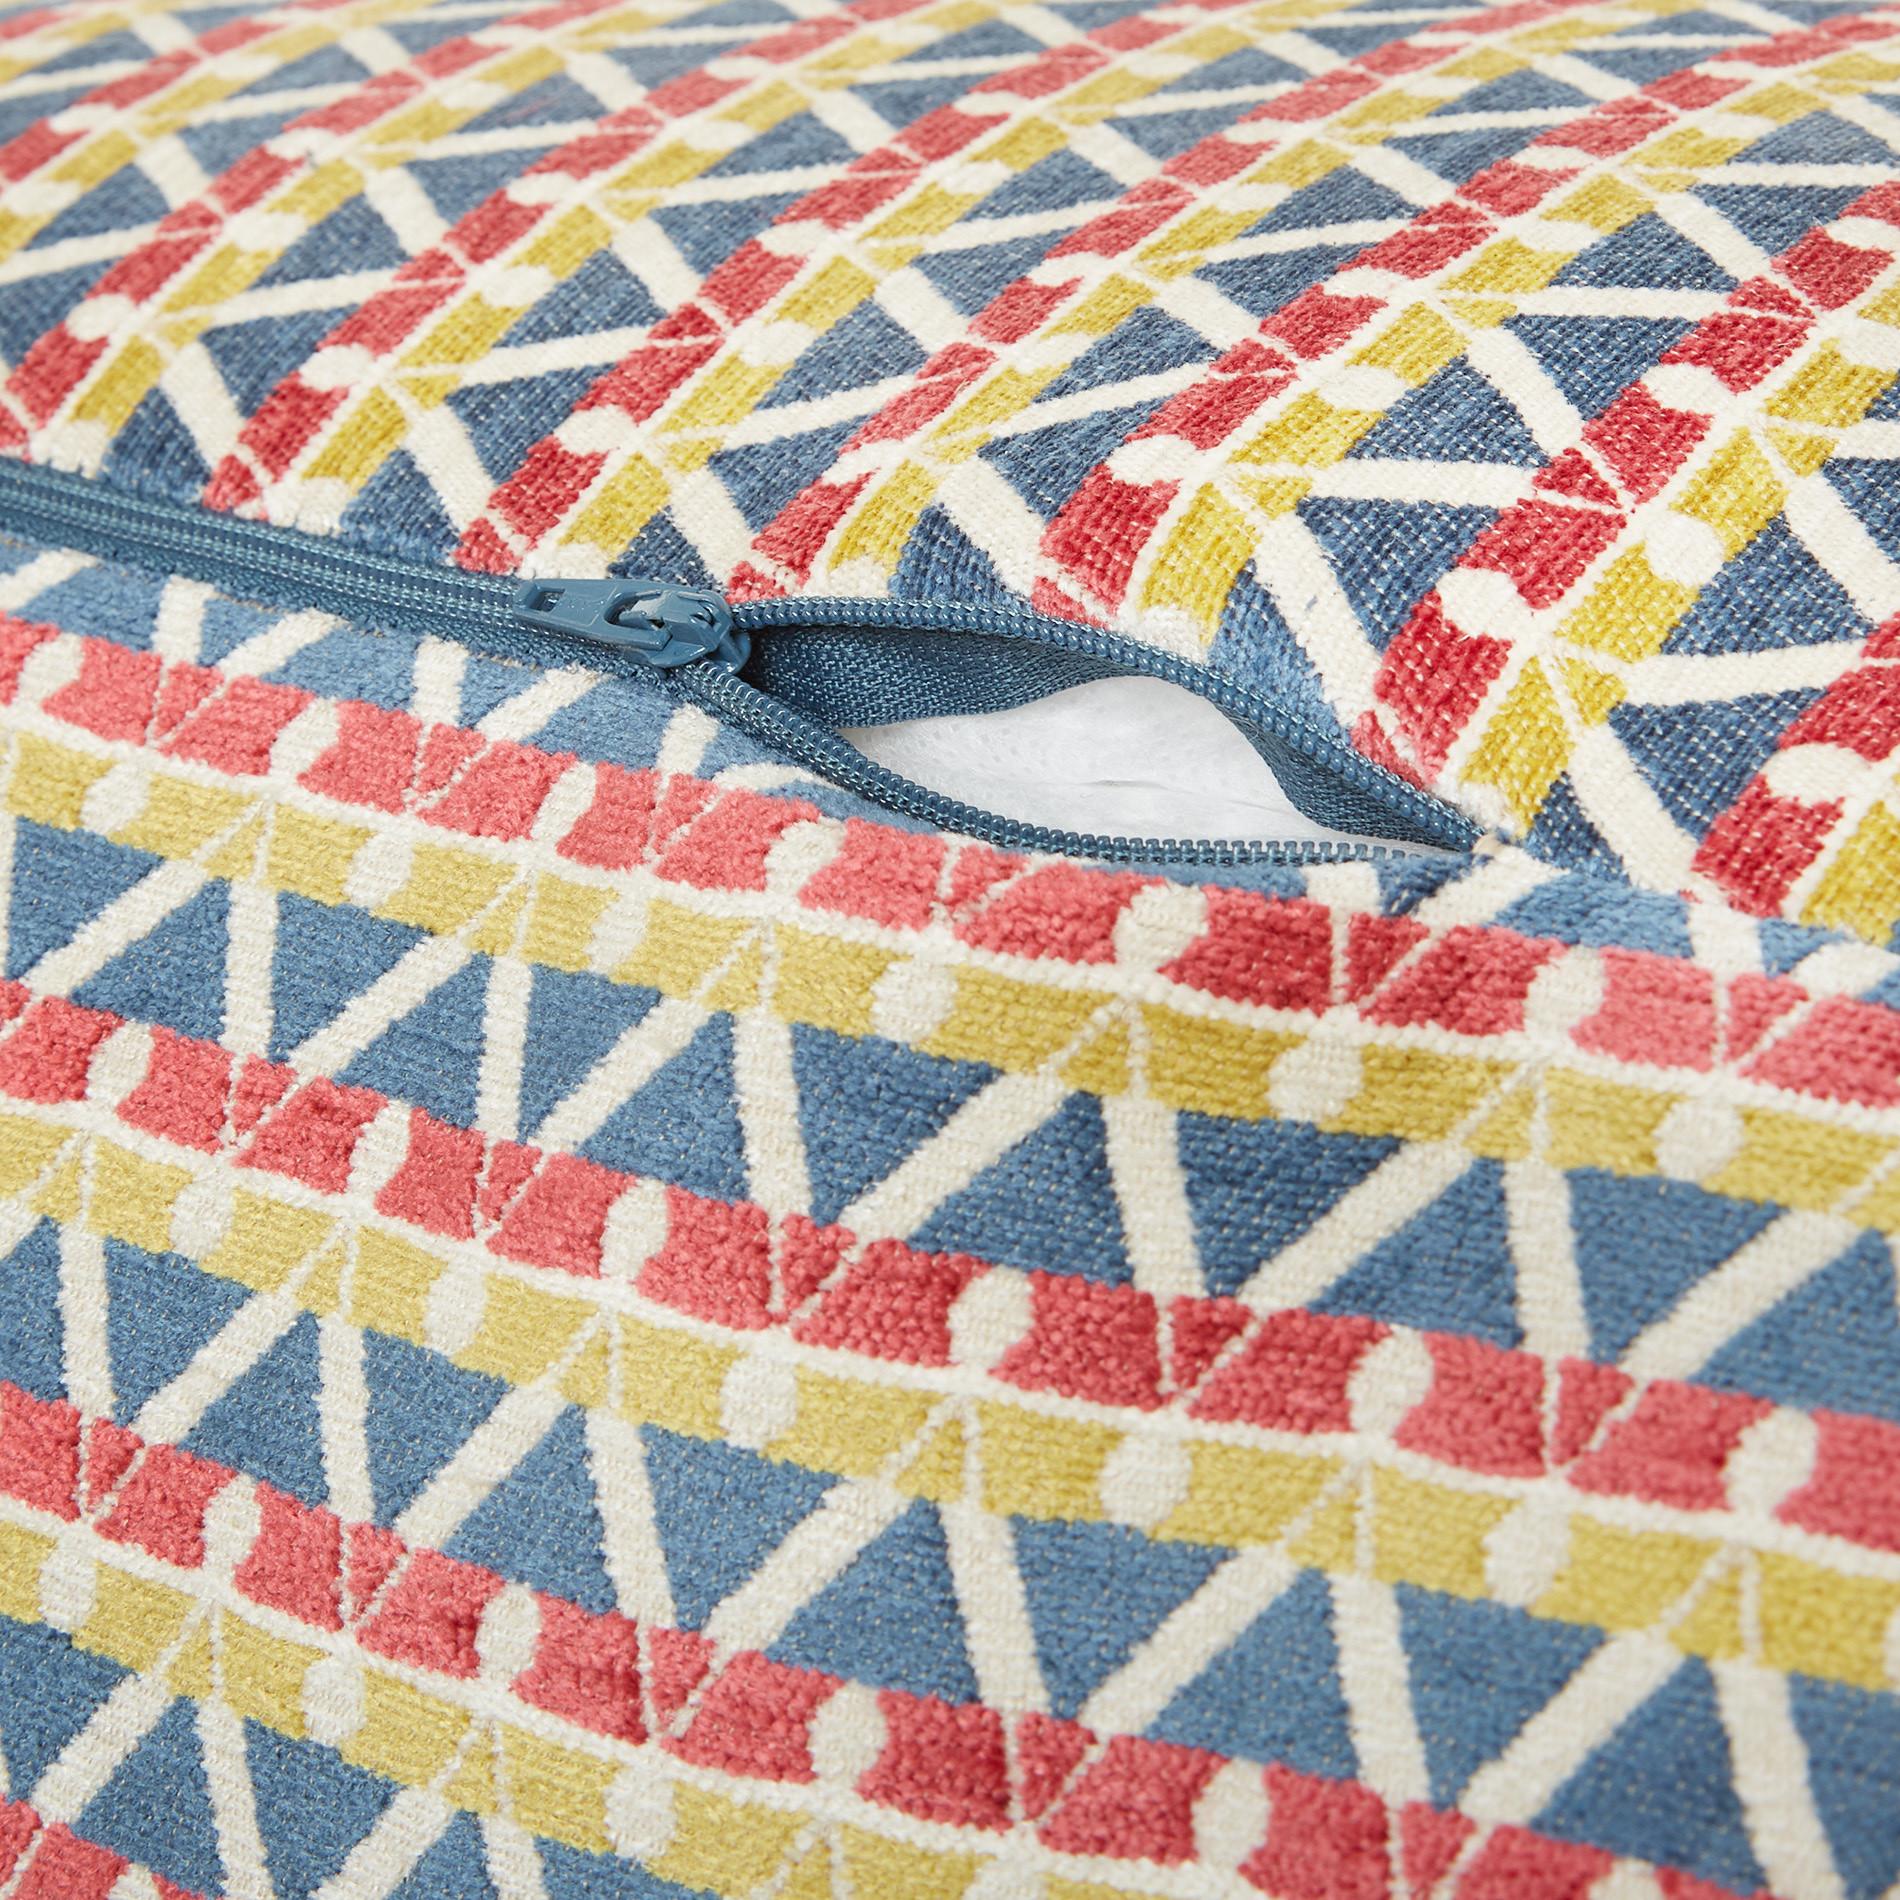 Pouf tessuto jacquard motivo geometrico, Multicolor, large image number 1